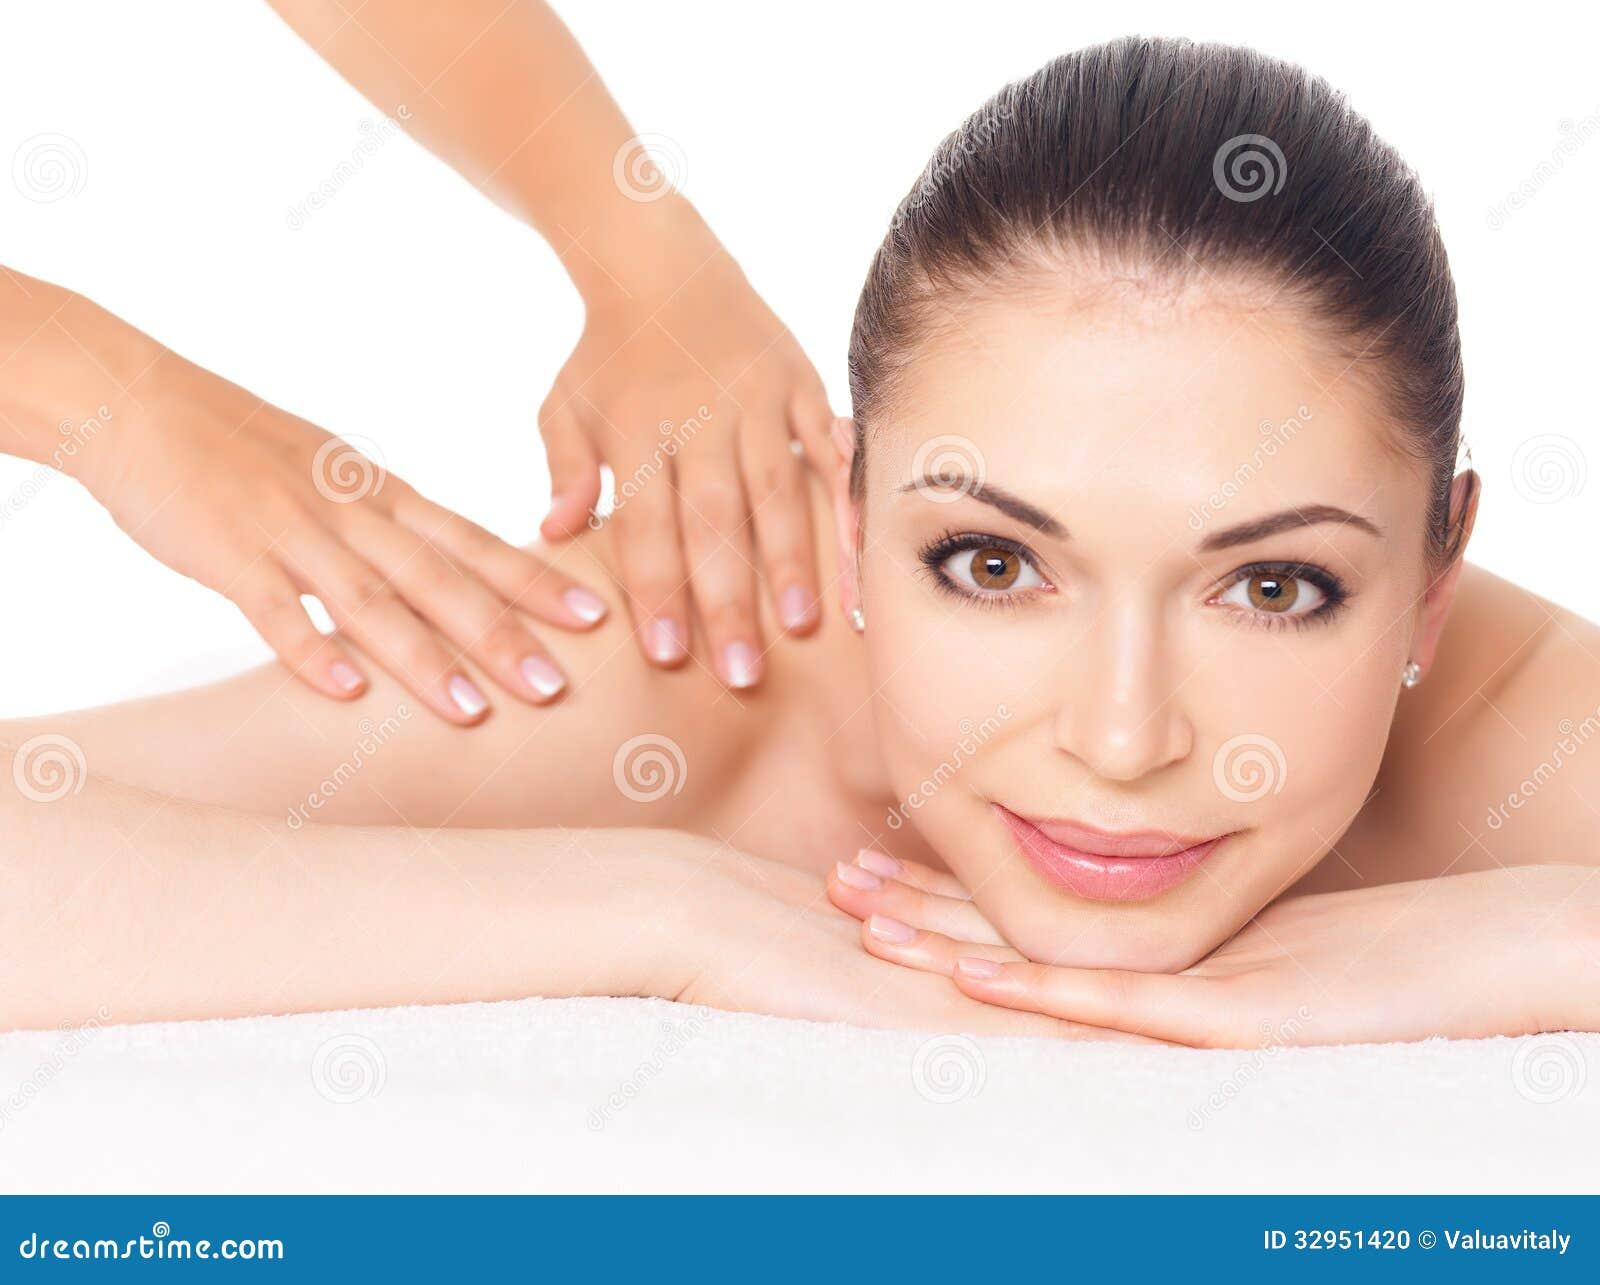 woman having massage of body in spa salon stock photo image 32951420. Black Bedroom Furniture Sets. Home Design Ideas